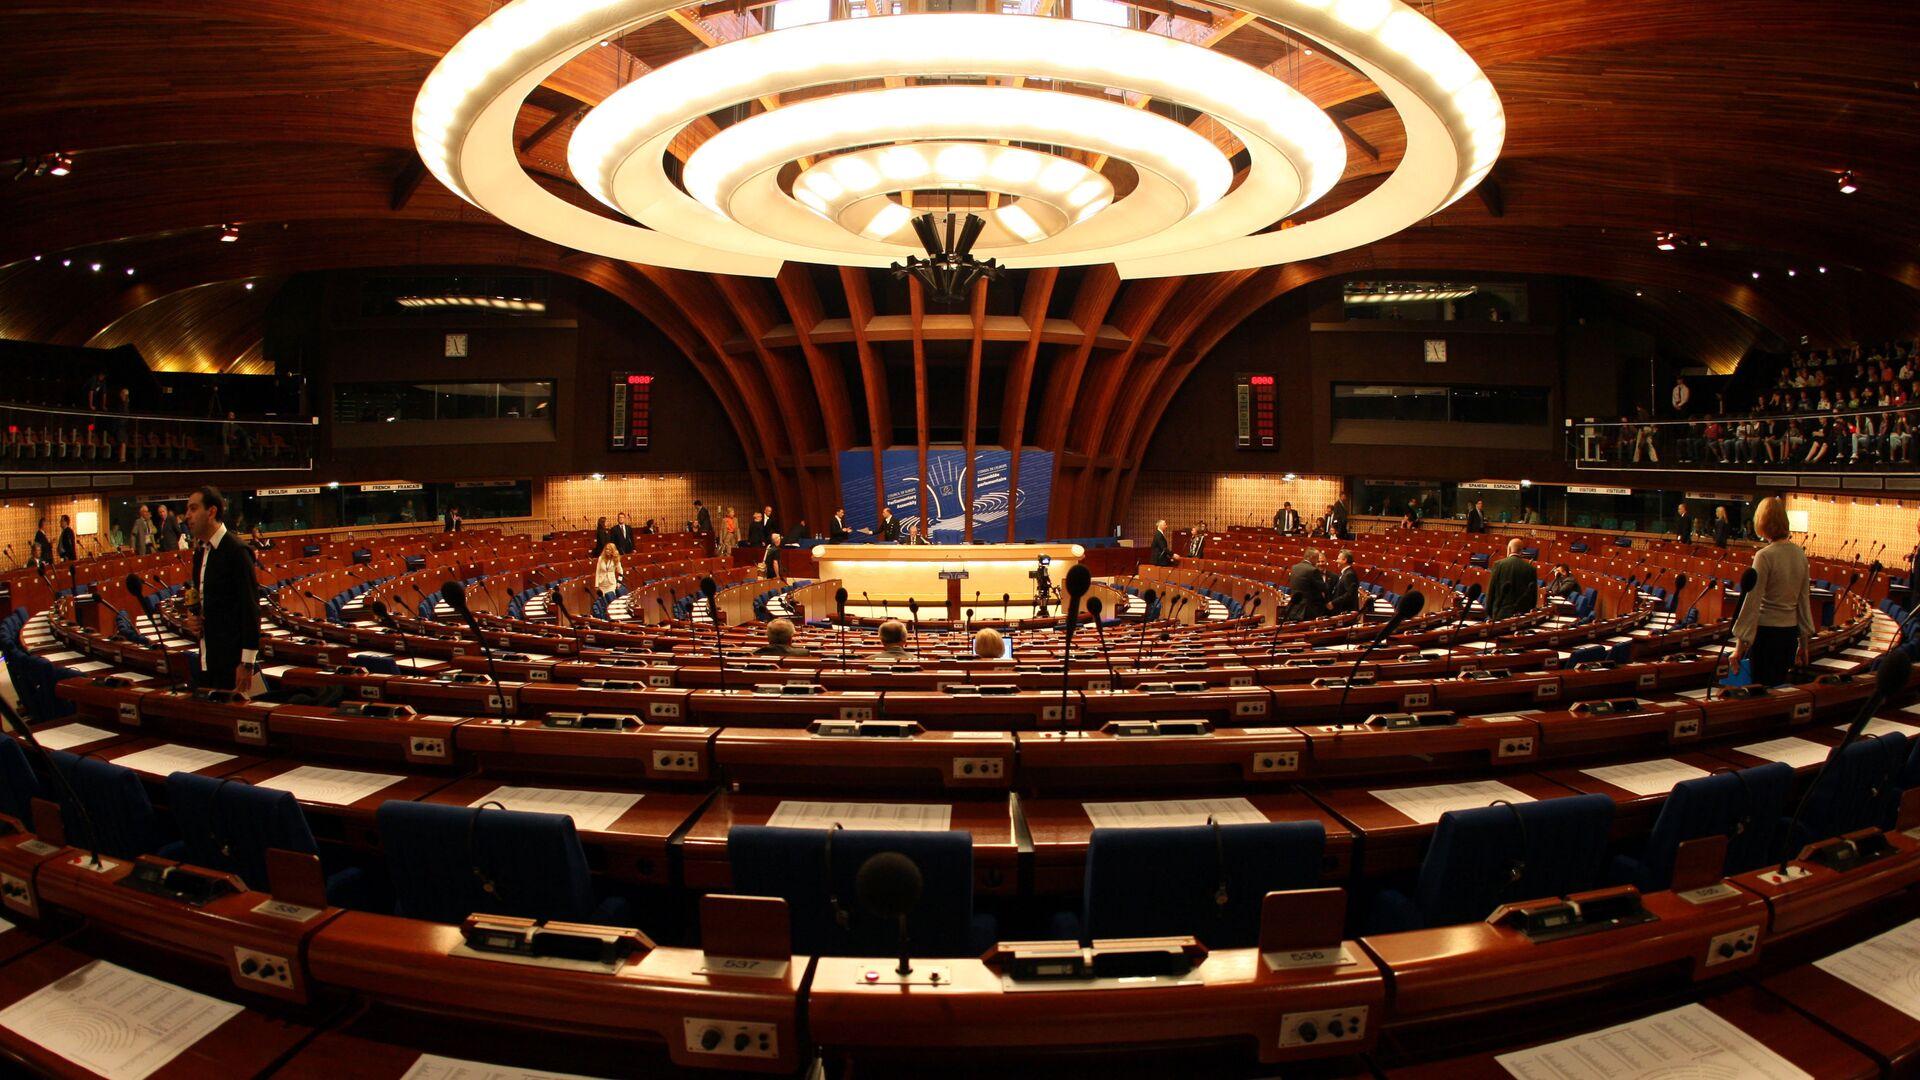 Asamblea Parlamentaria del Consejo de Europa (PACE) en Estrasburgo - Sputnik Mundo, 1920, 20.04.2021